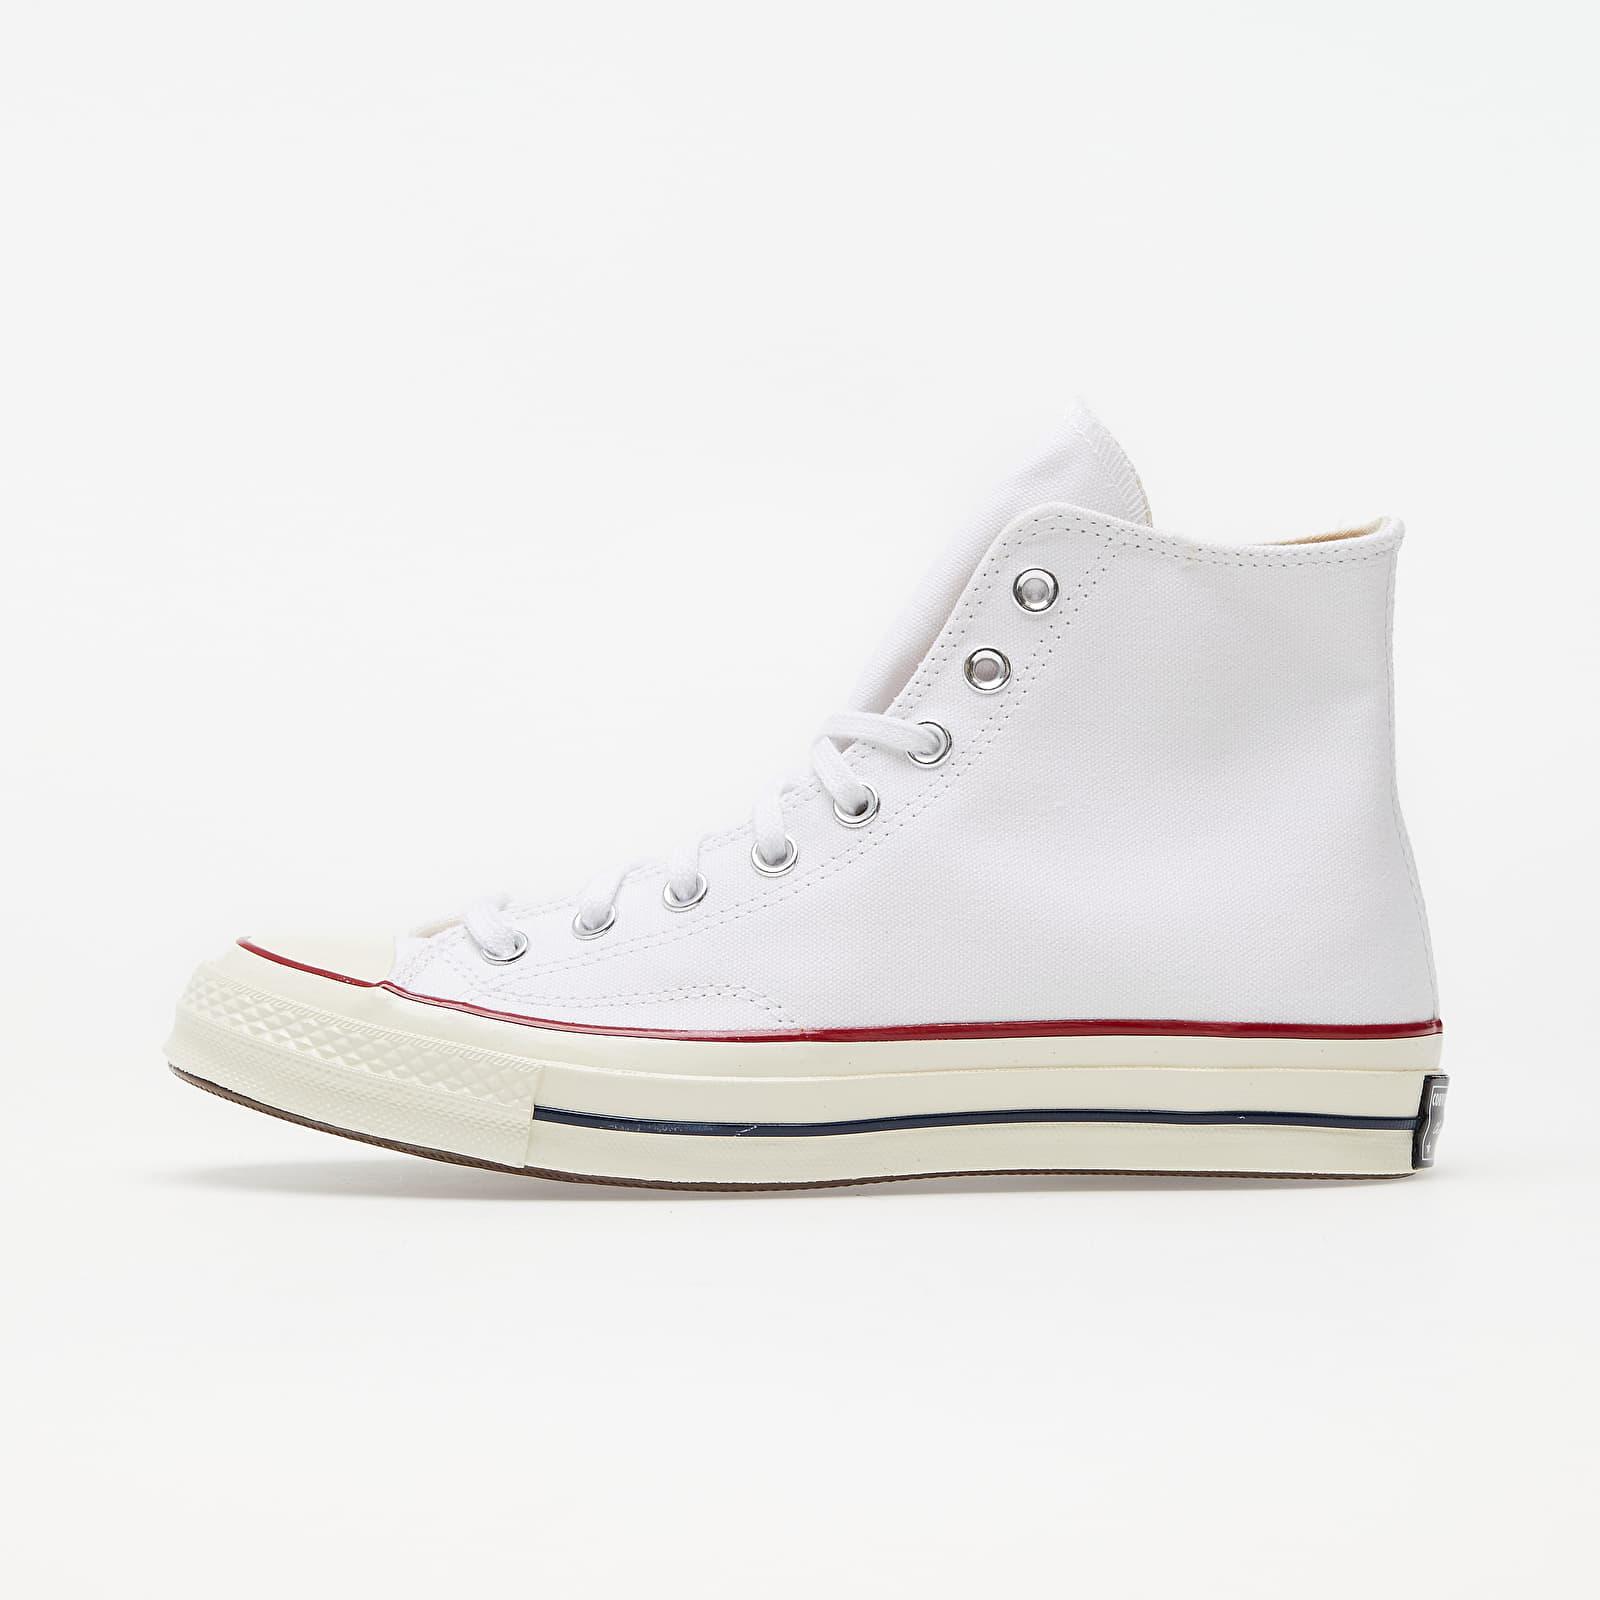 Converse Chuck Taylor All Star 70 Hi White/ Garnet/ Egret EUR 37.5